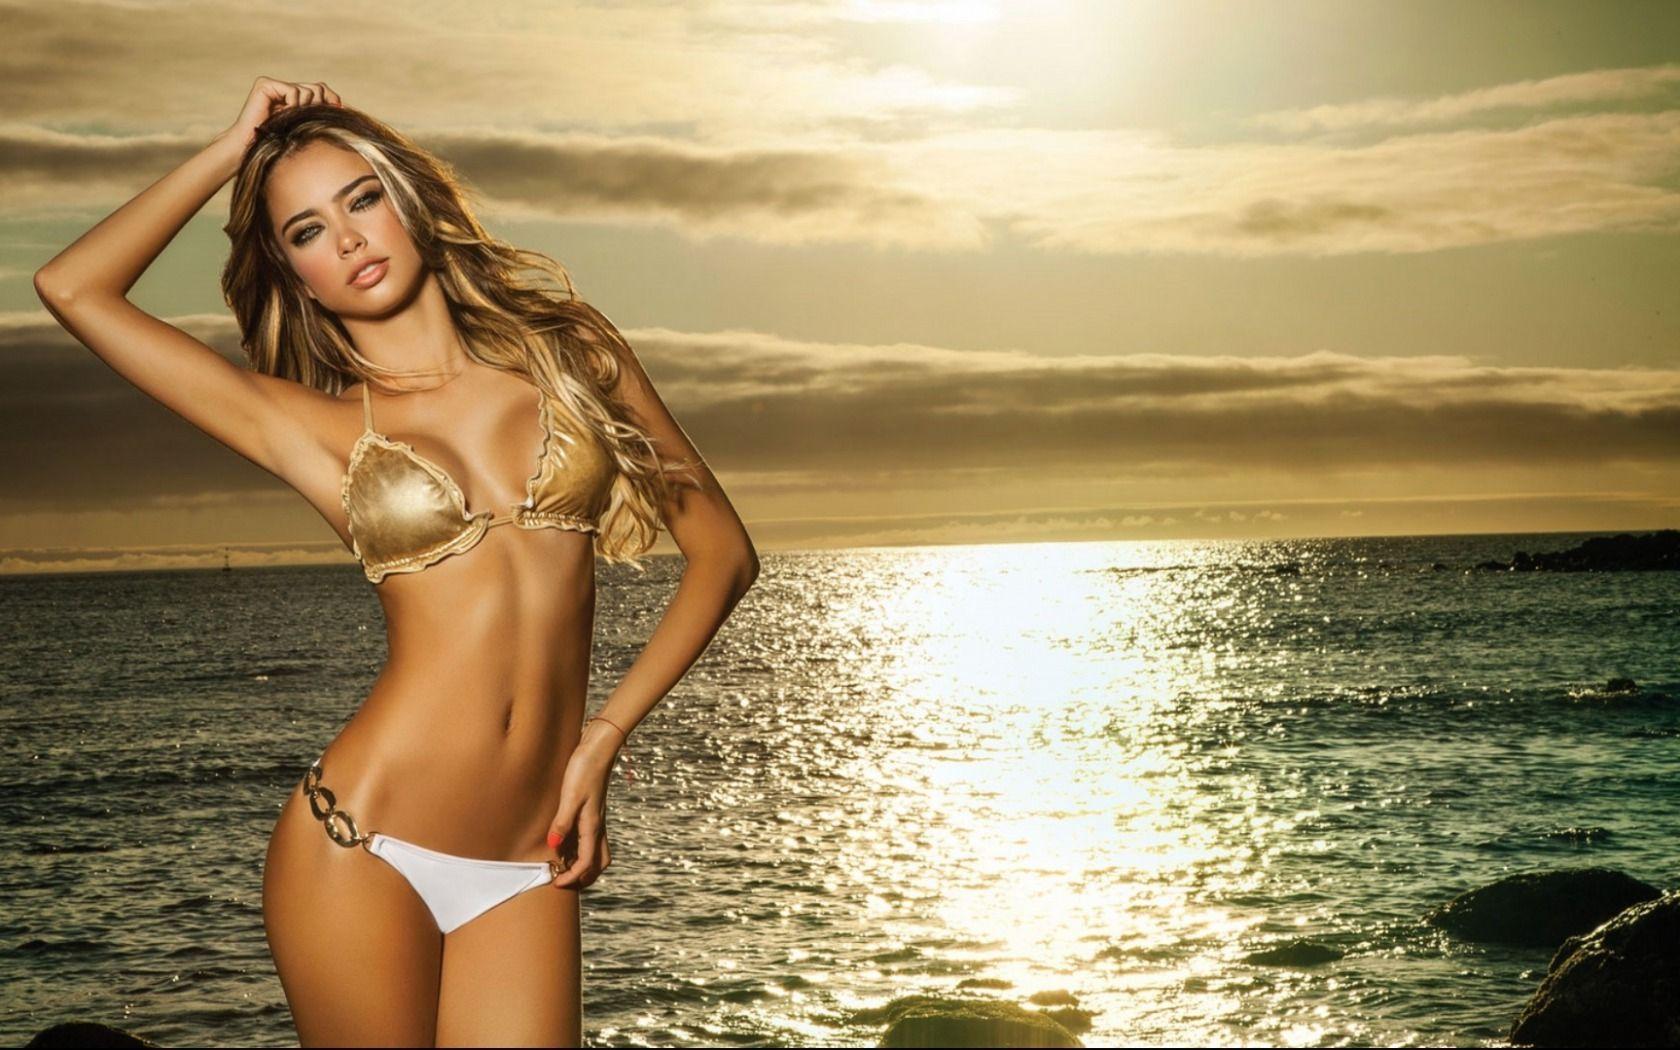 Earl reccomend Free bikini model wallpapers